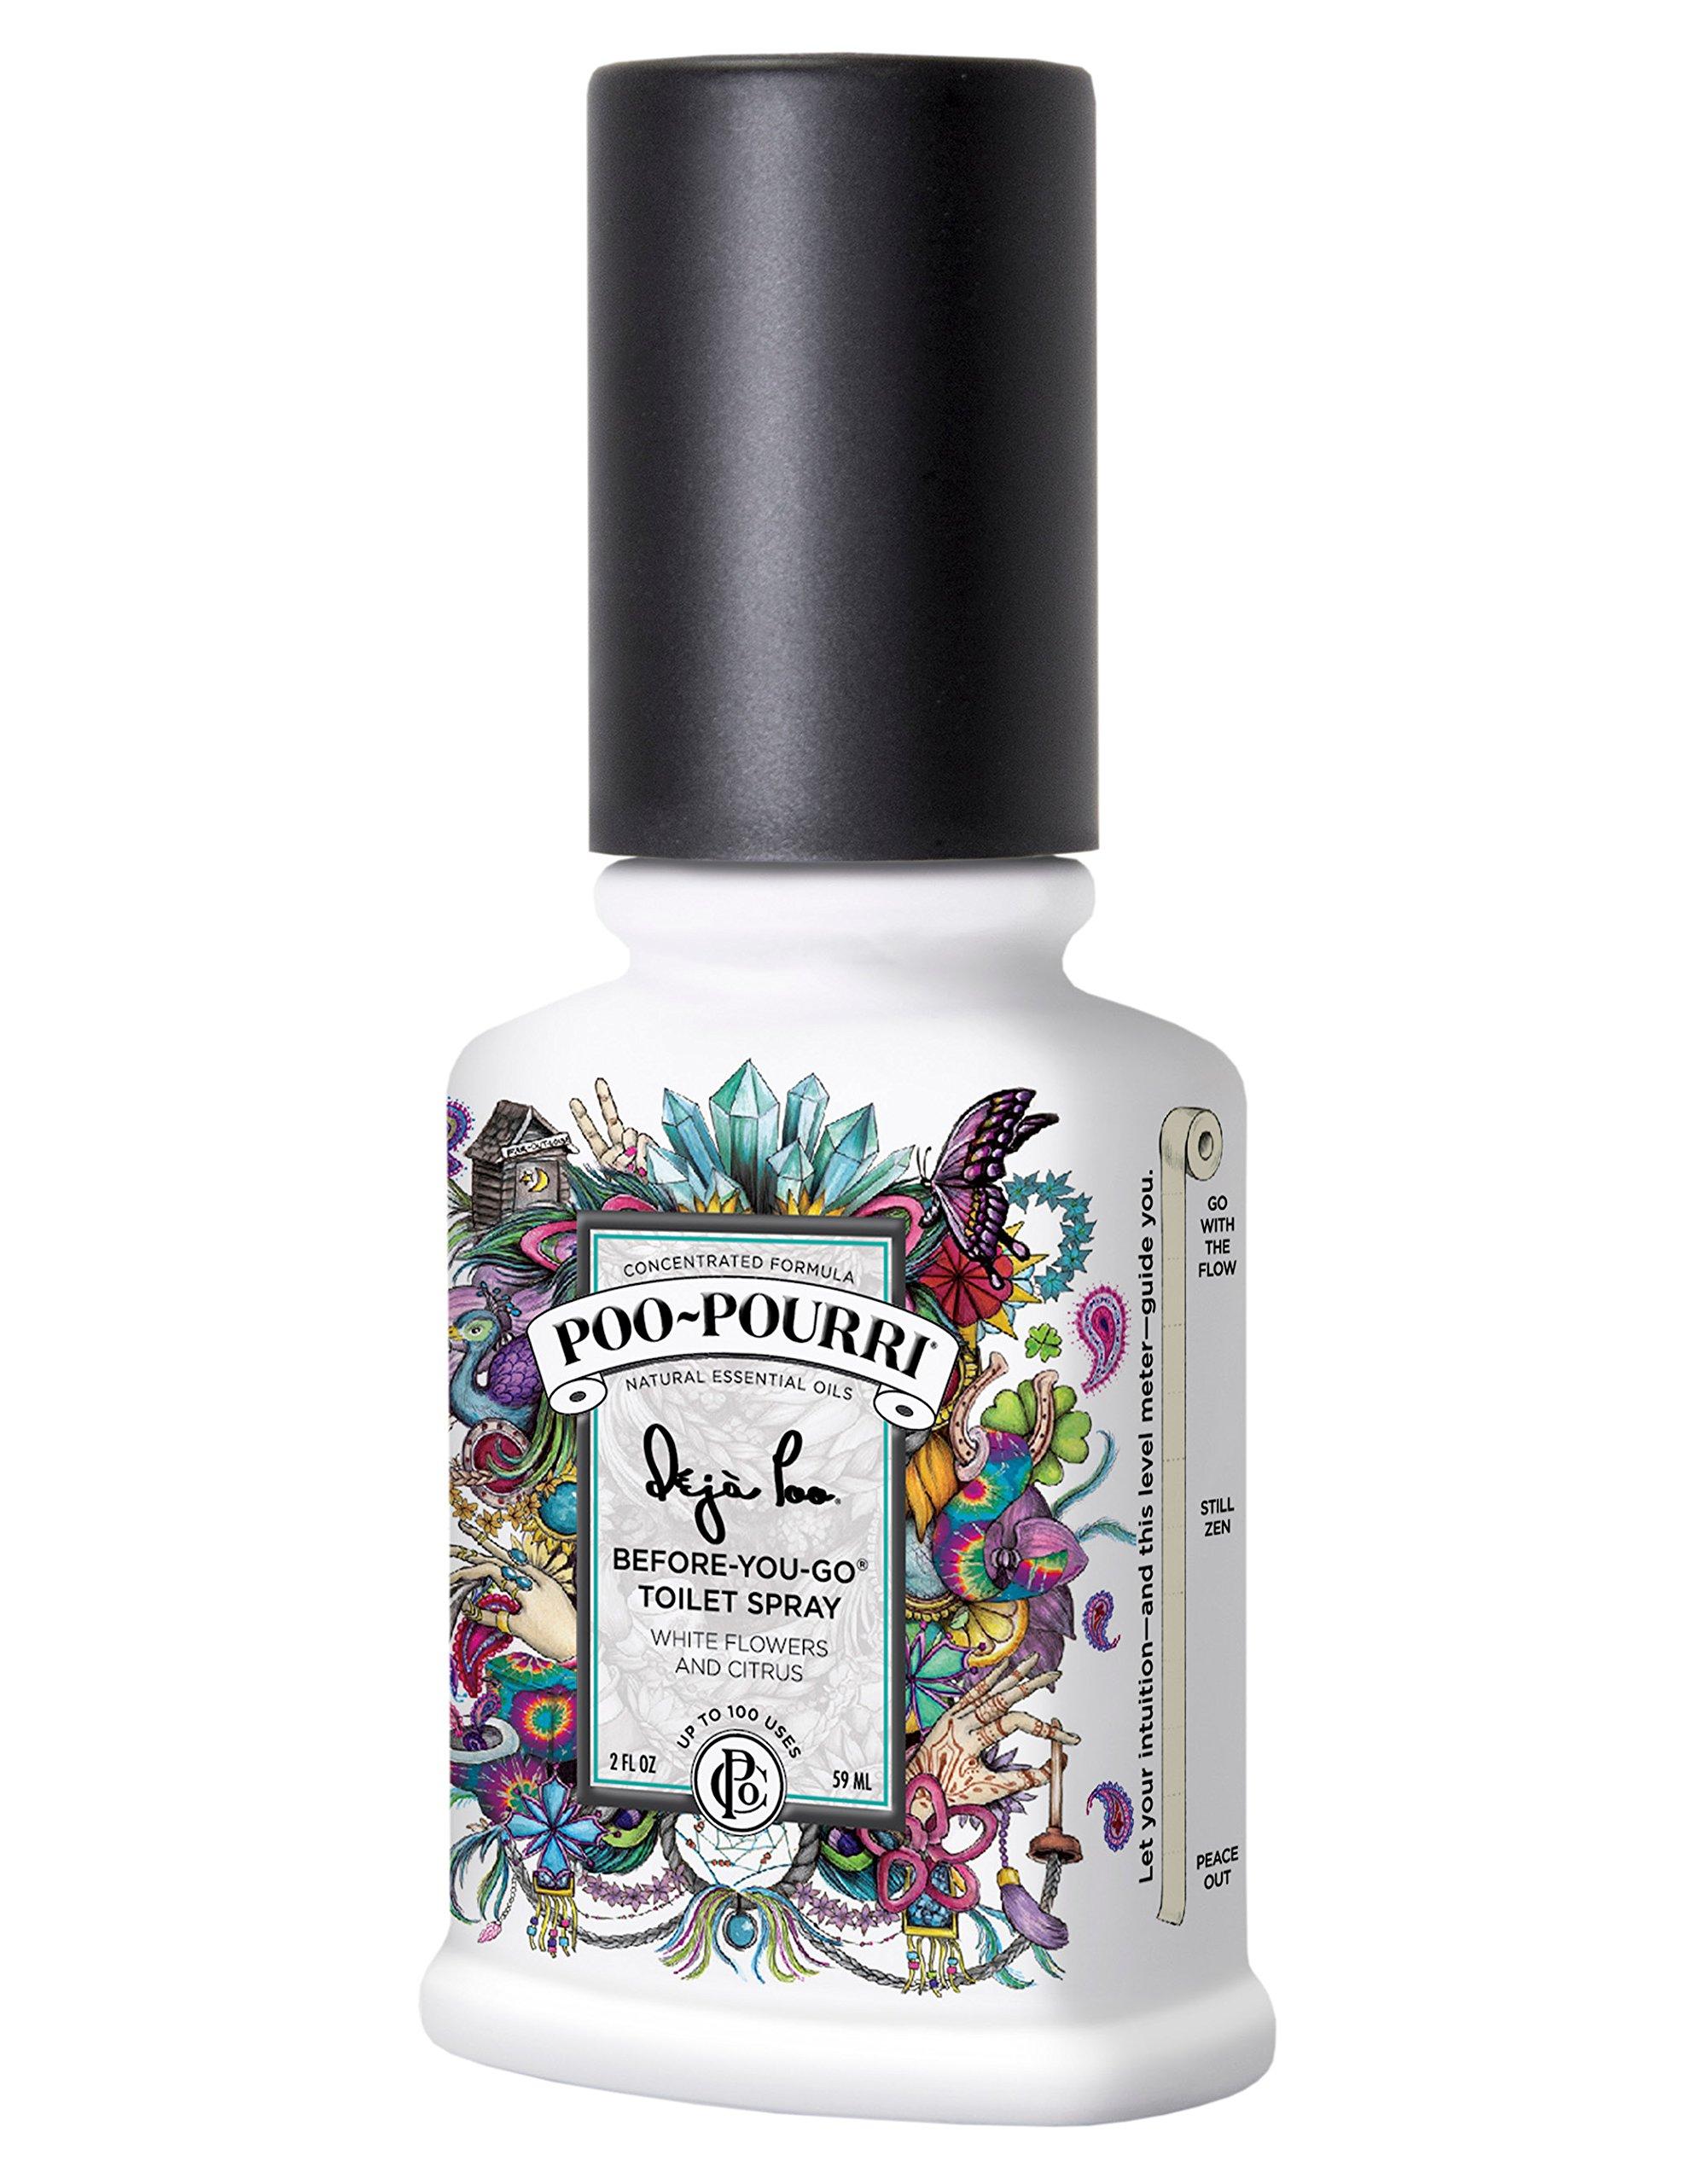 Poo-Pourri Before-You-Go Toilet Spray 2-Ounce Bottle, Deja Poo Scent